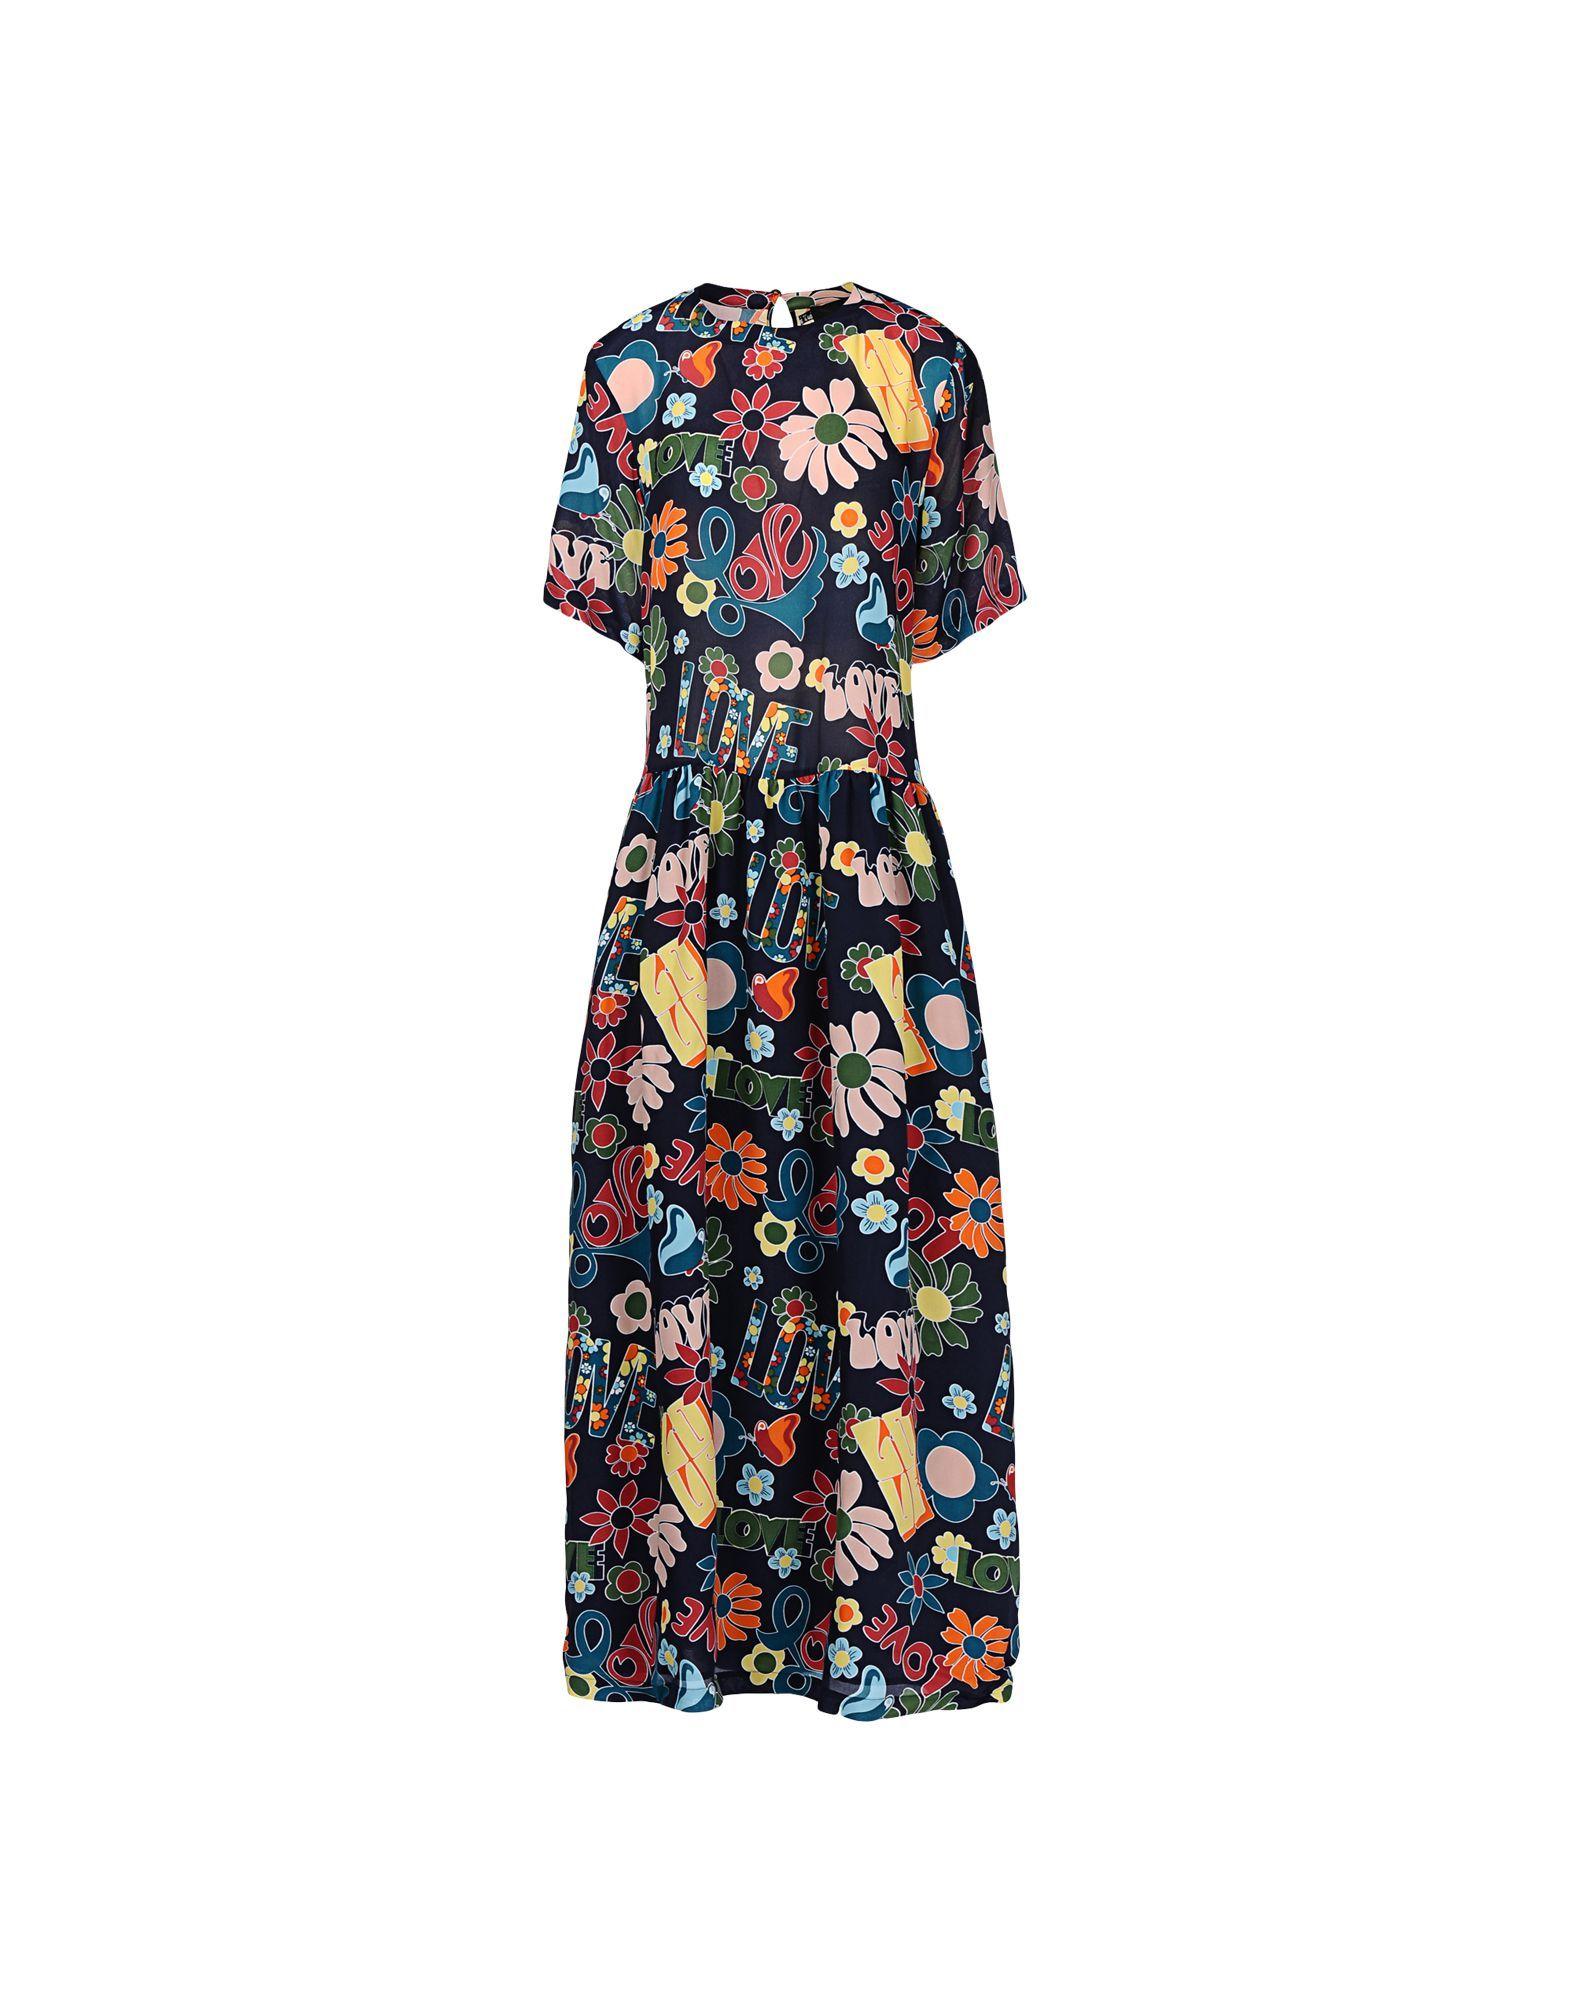 Long Dress Women - Moschino Online Store $ 940.00